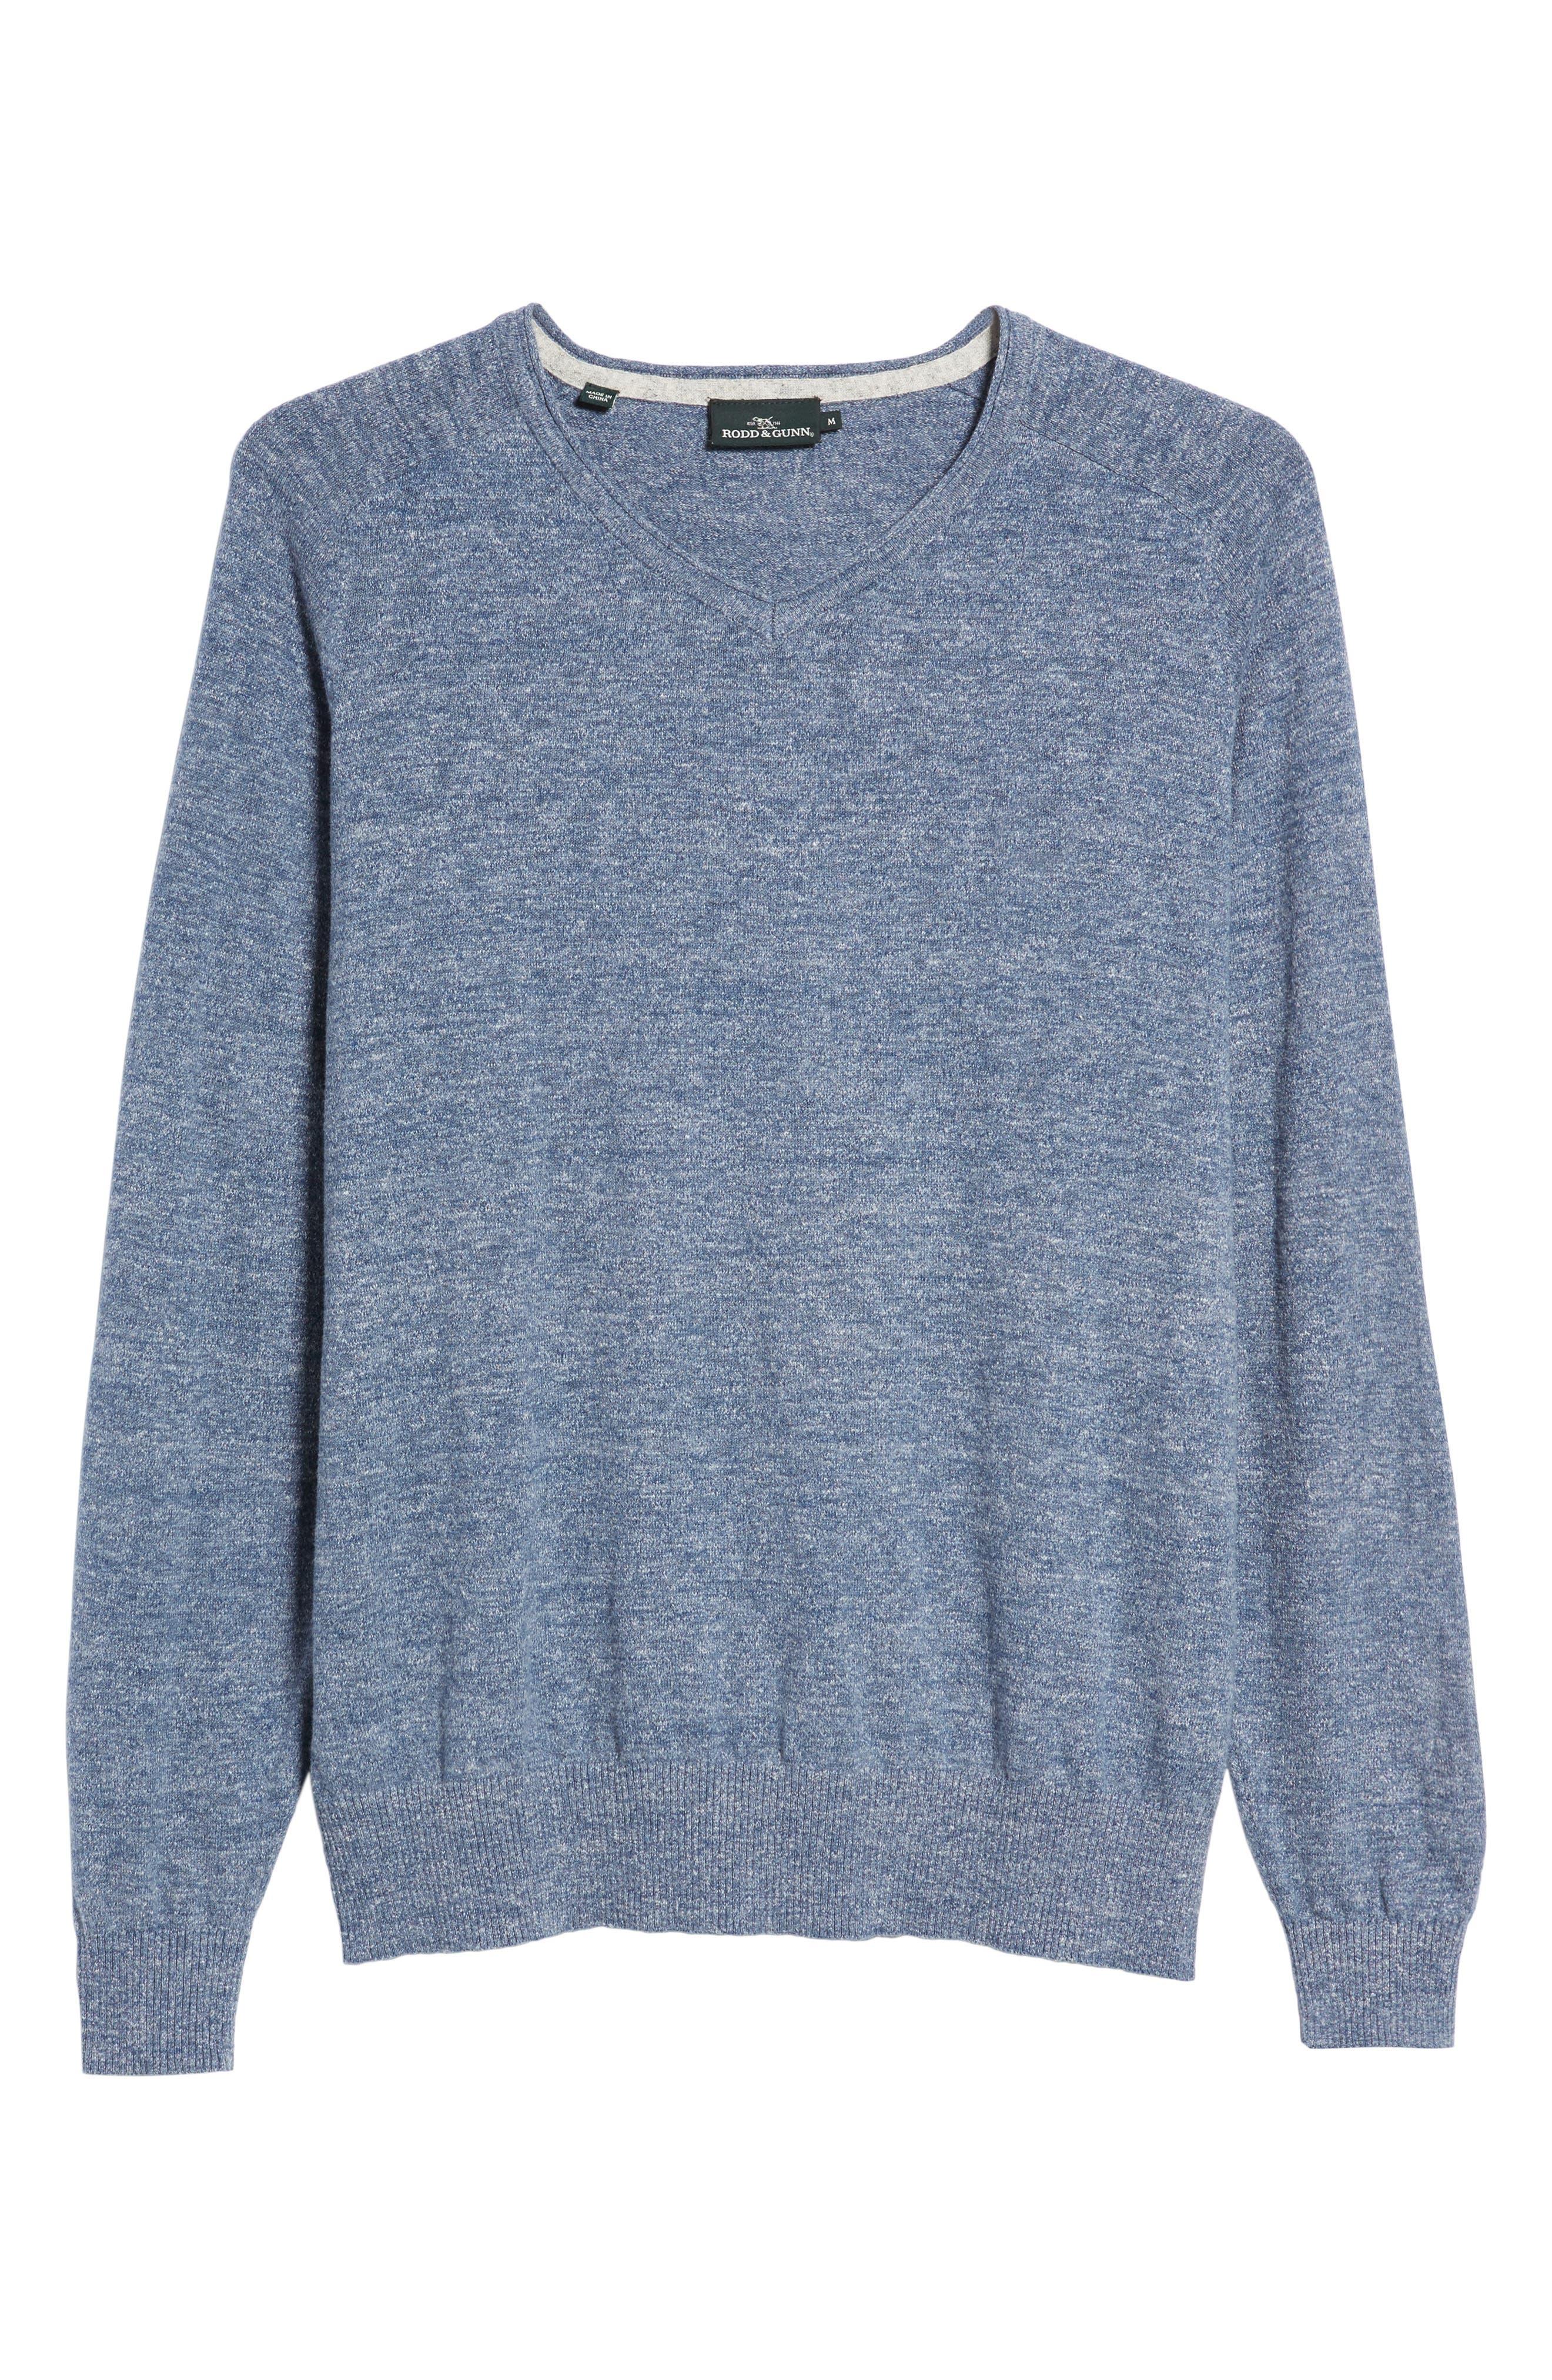 Arbors Cotton V-Neck Sweater,                             Alternate thumbnail 6, color,                             Riviera